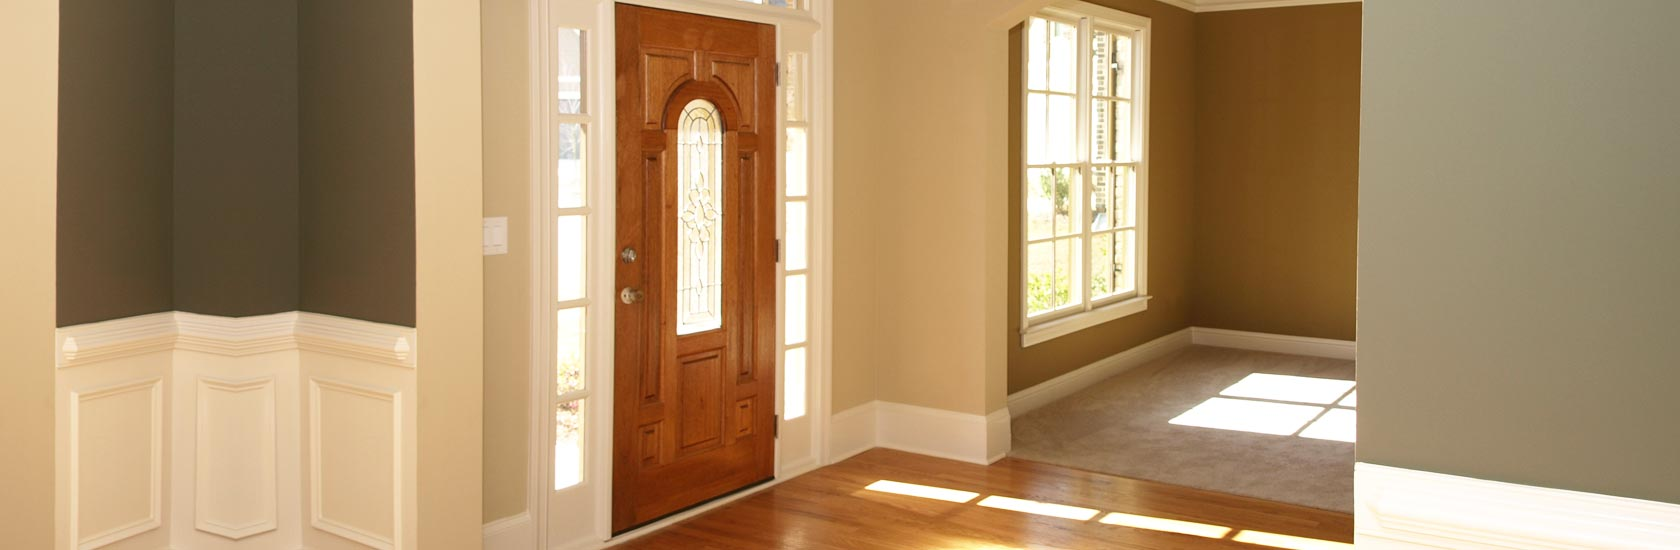 t reneinbau holzanfertigung t ren f r neubau und. Black Bedroom Furniture Sets. Home Design Ideas